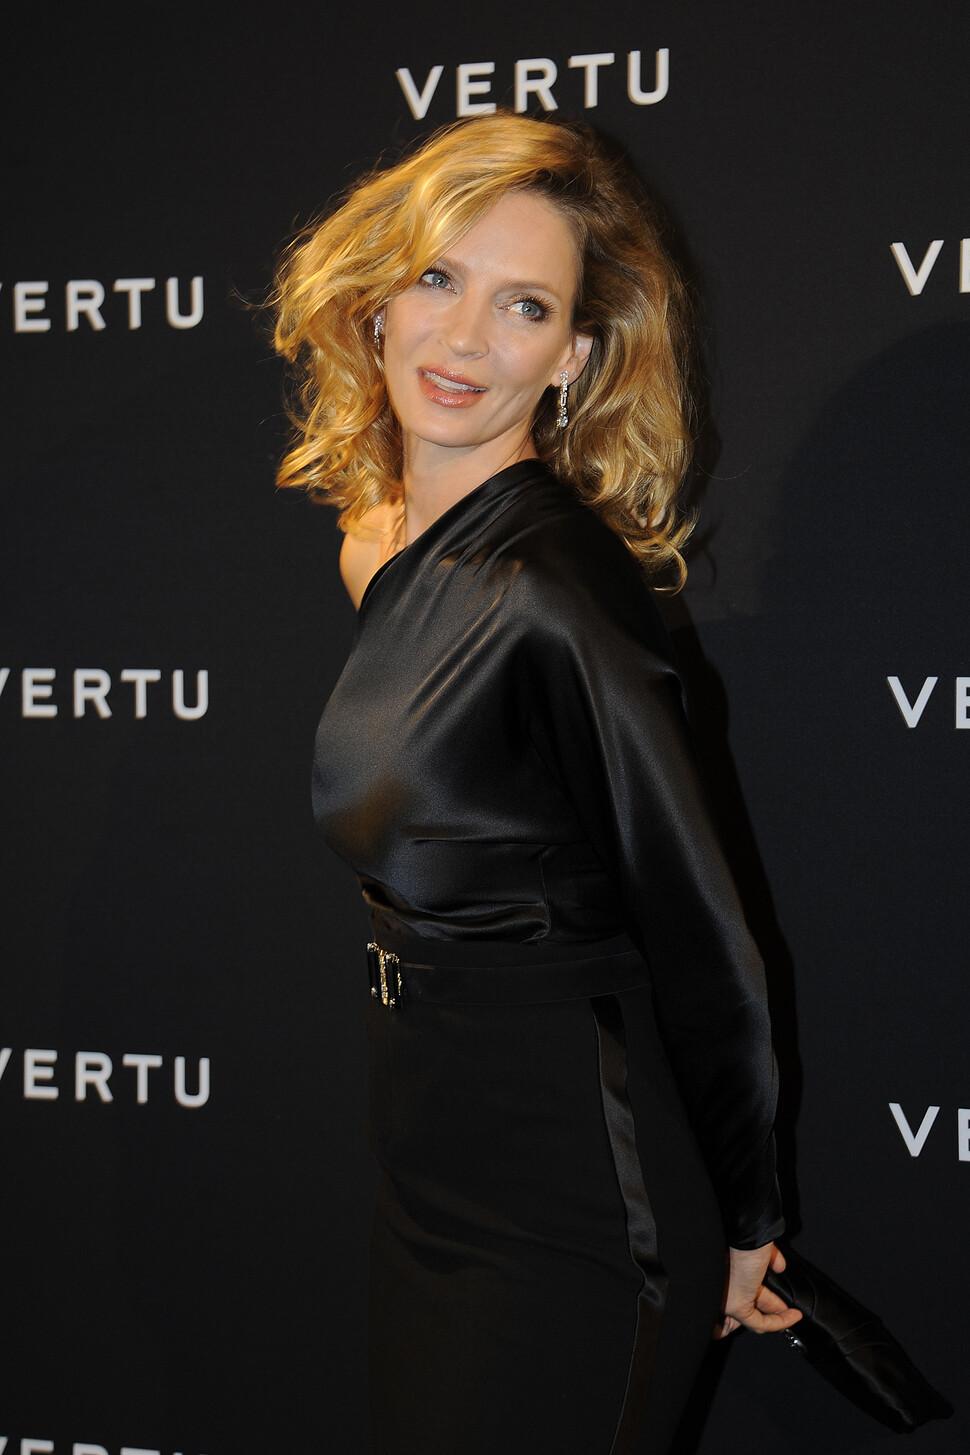 Звезды на презентации нового смартфона Vertu в Милане